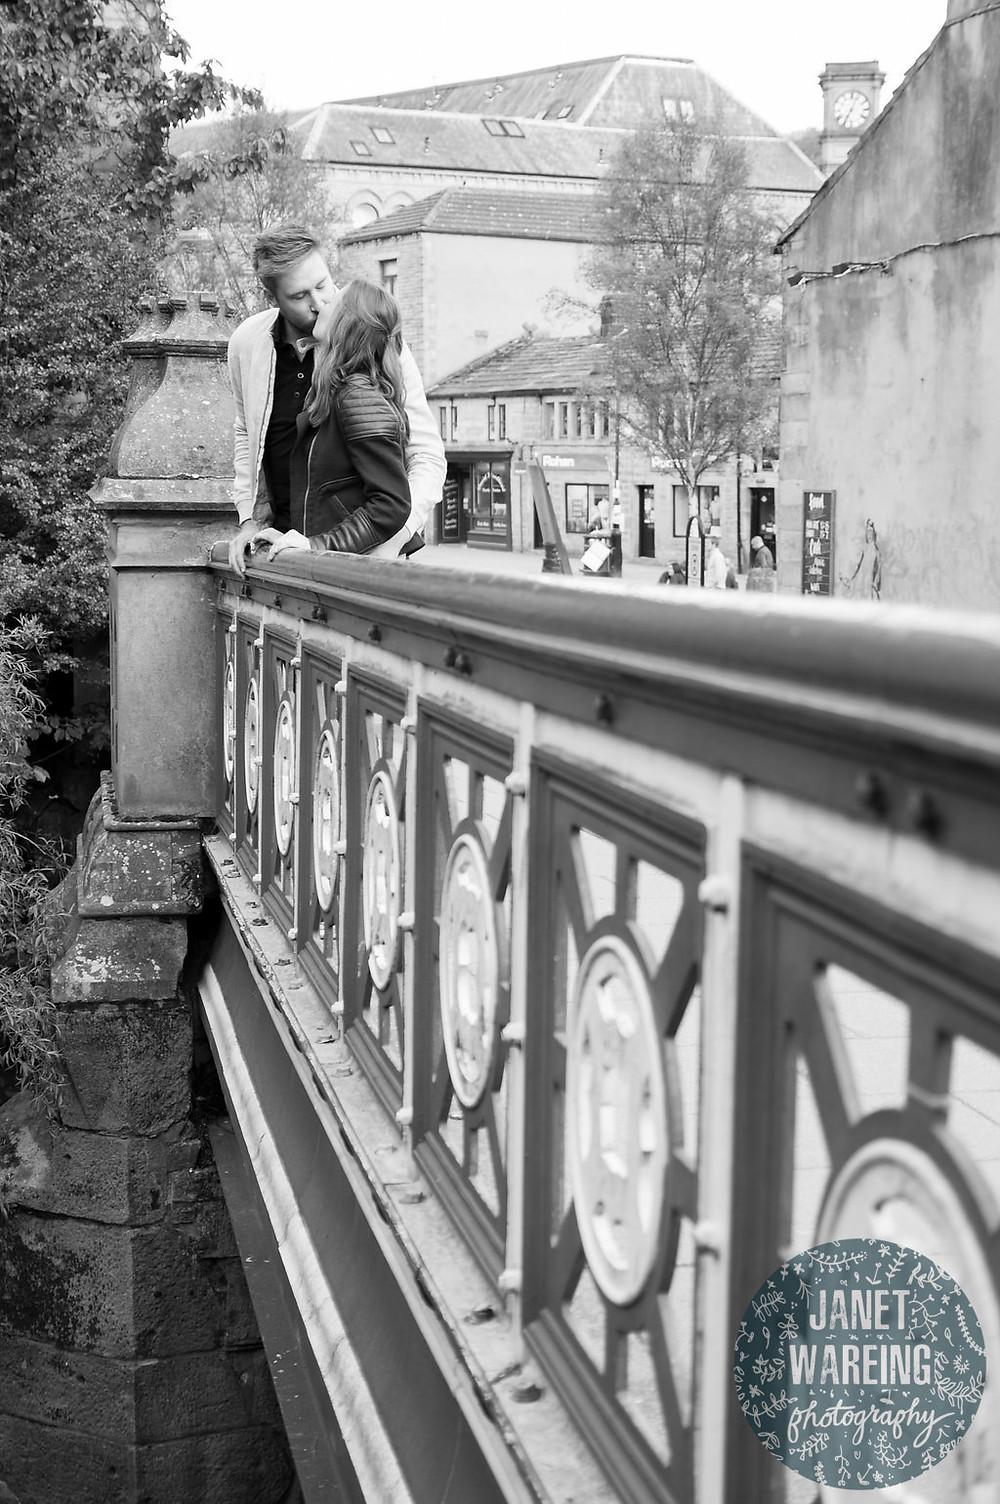 engagement shoot, couple's photographs, family photo shoot, Hebden Bridge, Todmorden, West Yorkshire, blossom tree photo, photo shoot, engagement, engaged, west yorkshire, wedding photographer, north west wedding photographer, hebden bridge wedding photographer, todmorden wedding photographer, unposed, natural, documentary, no posing,